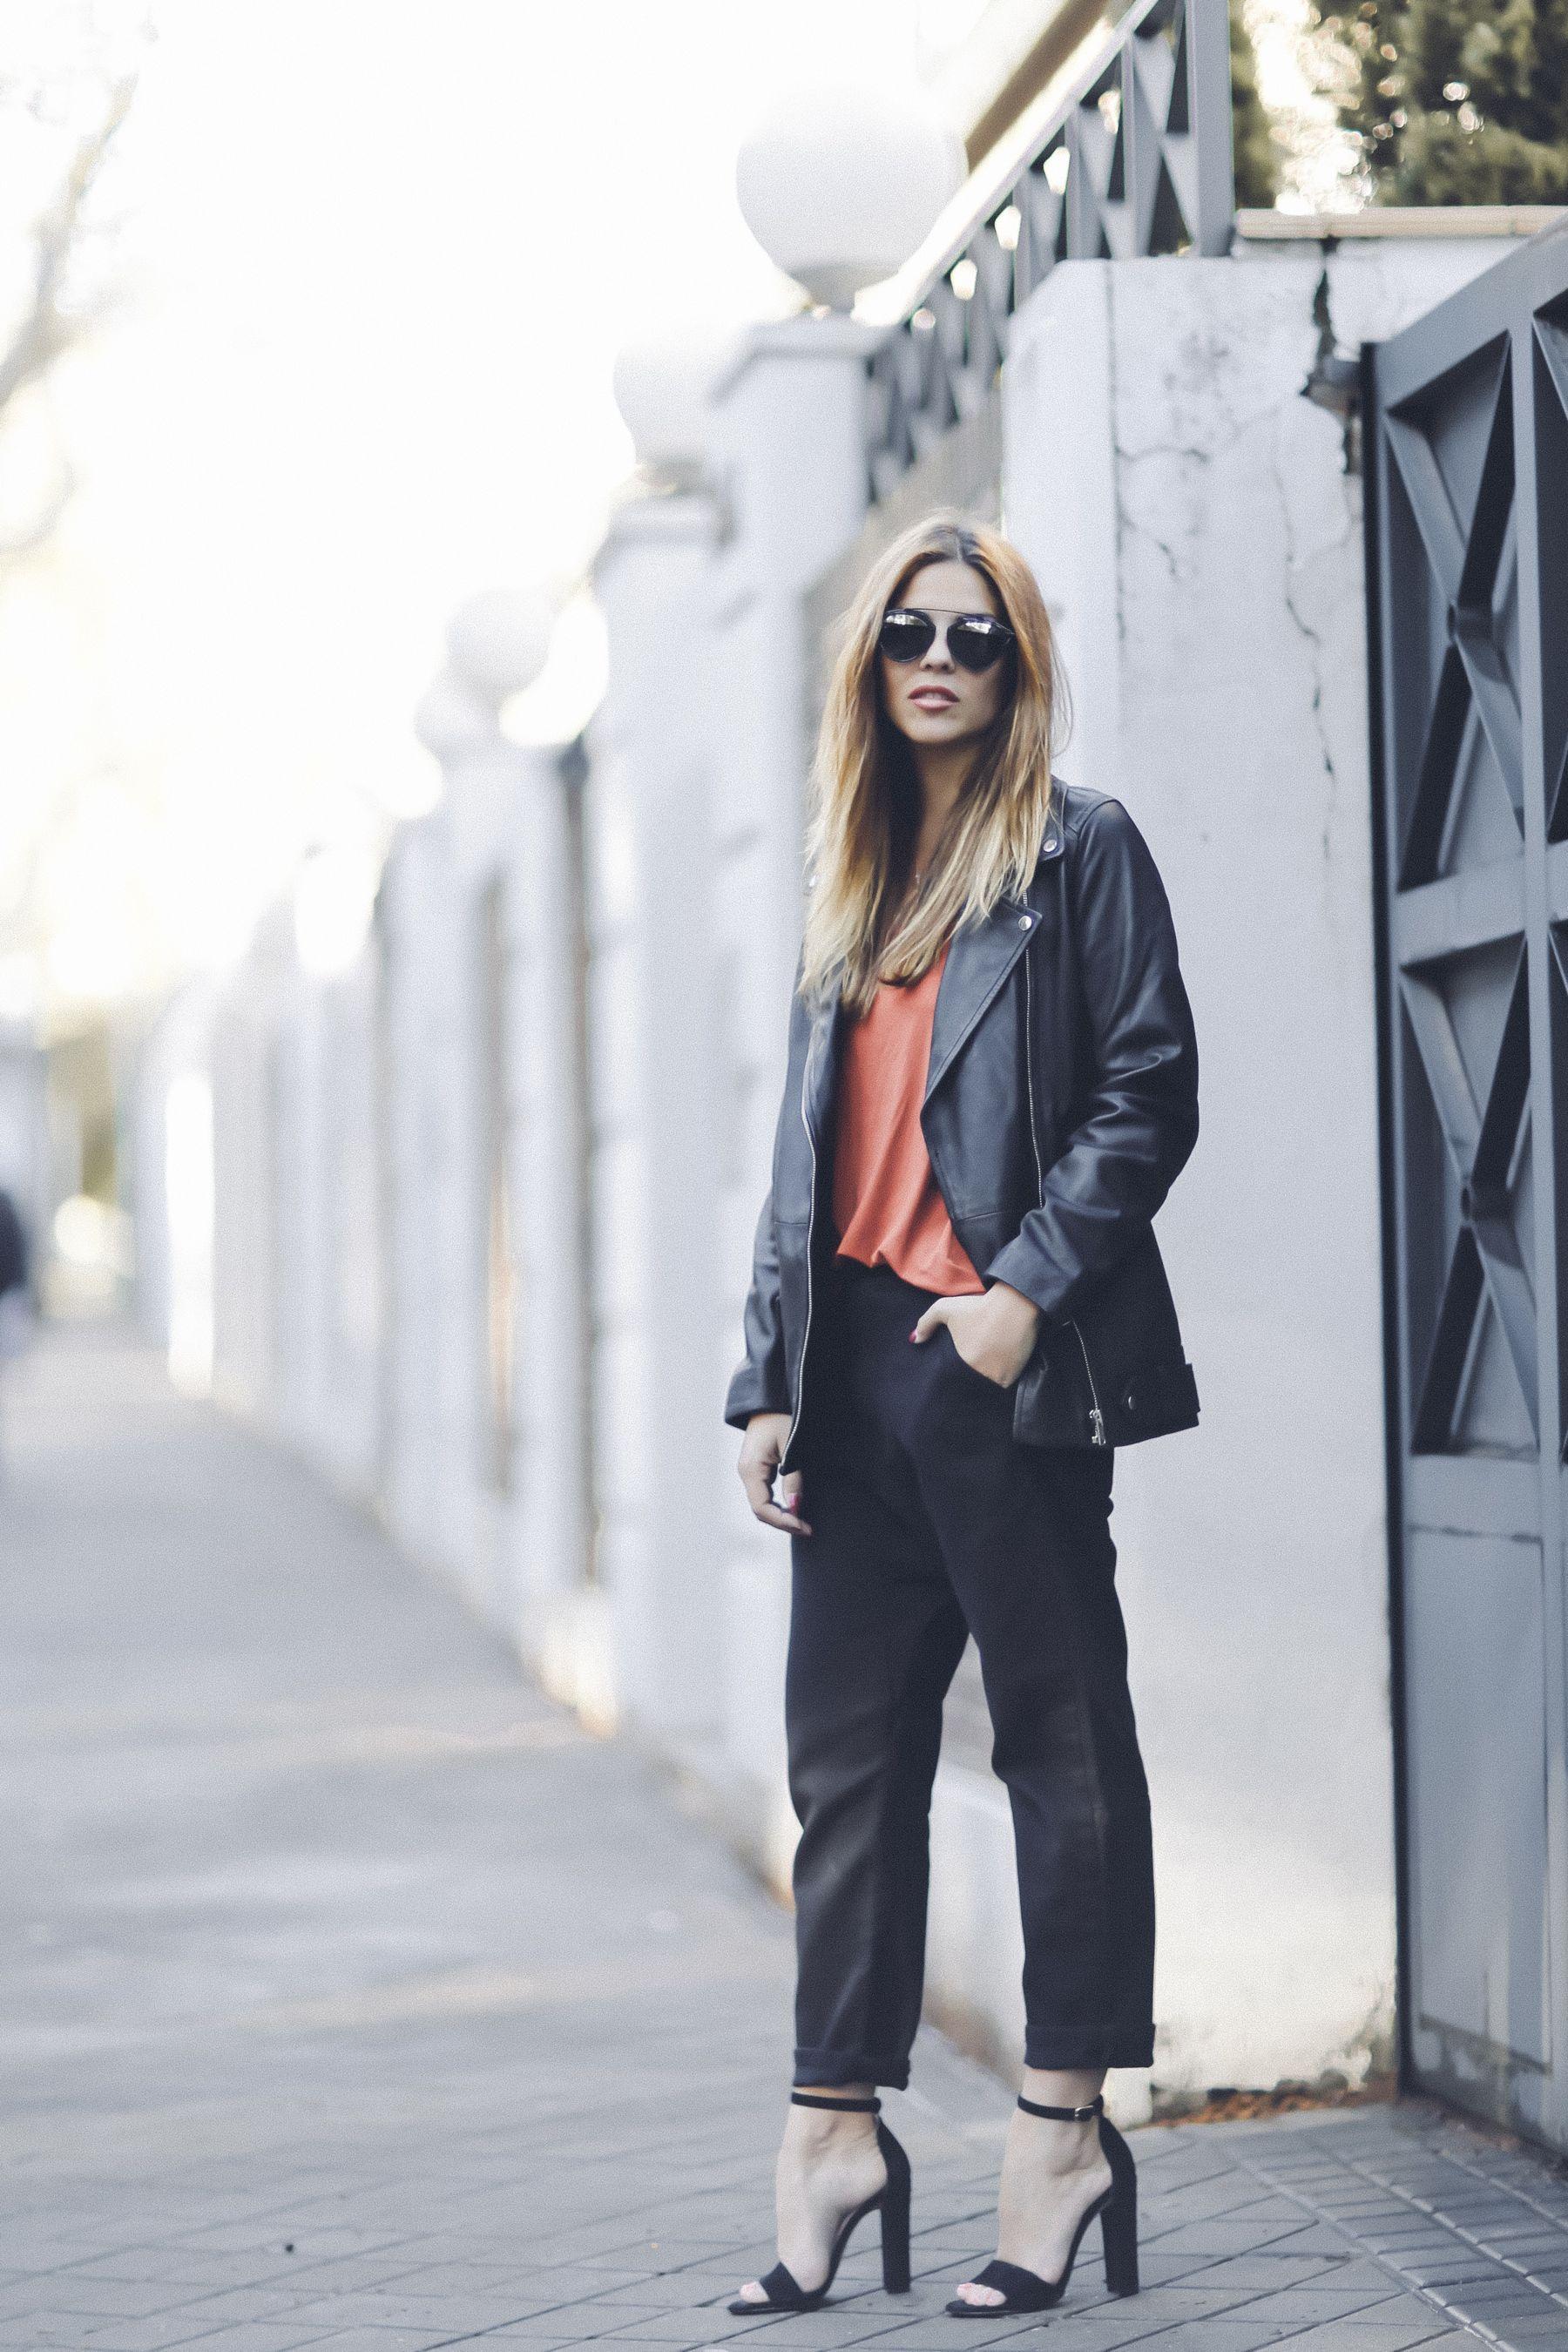 sandalias sandals mbym outfit look primavera spring camiseta zara steve madden Dior gafas de sol sunglasses street style trendy taste_2